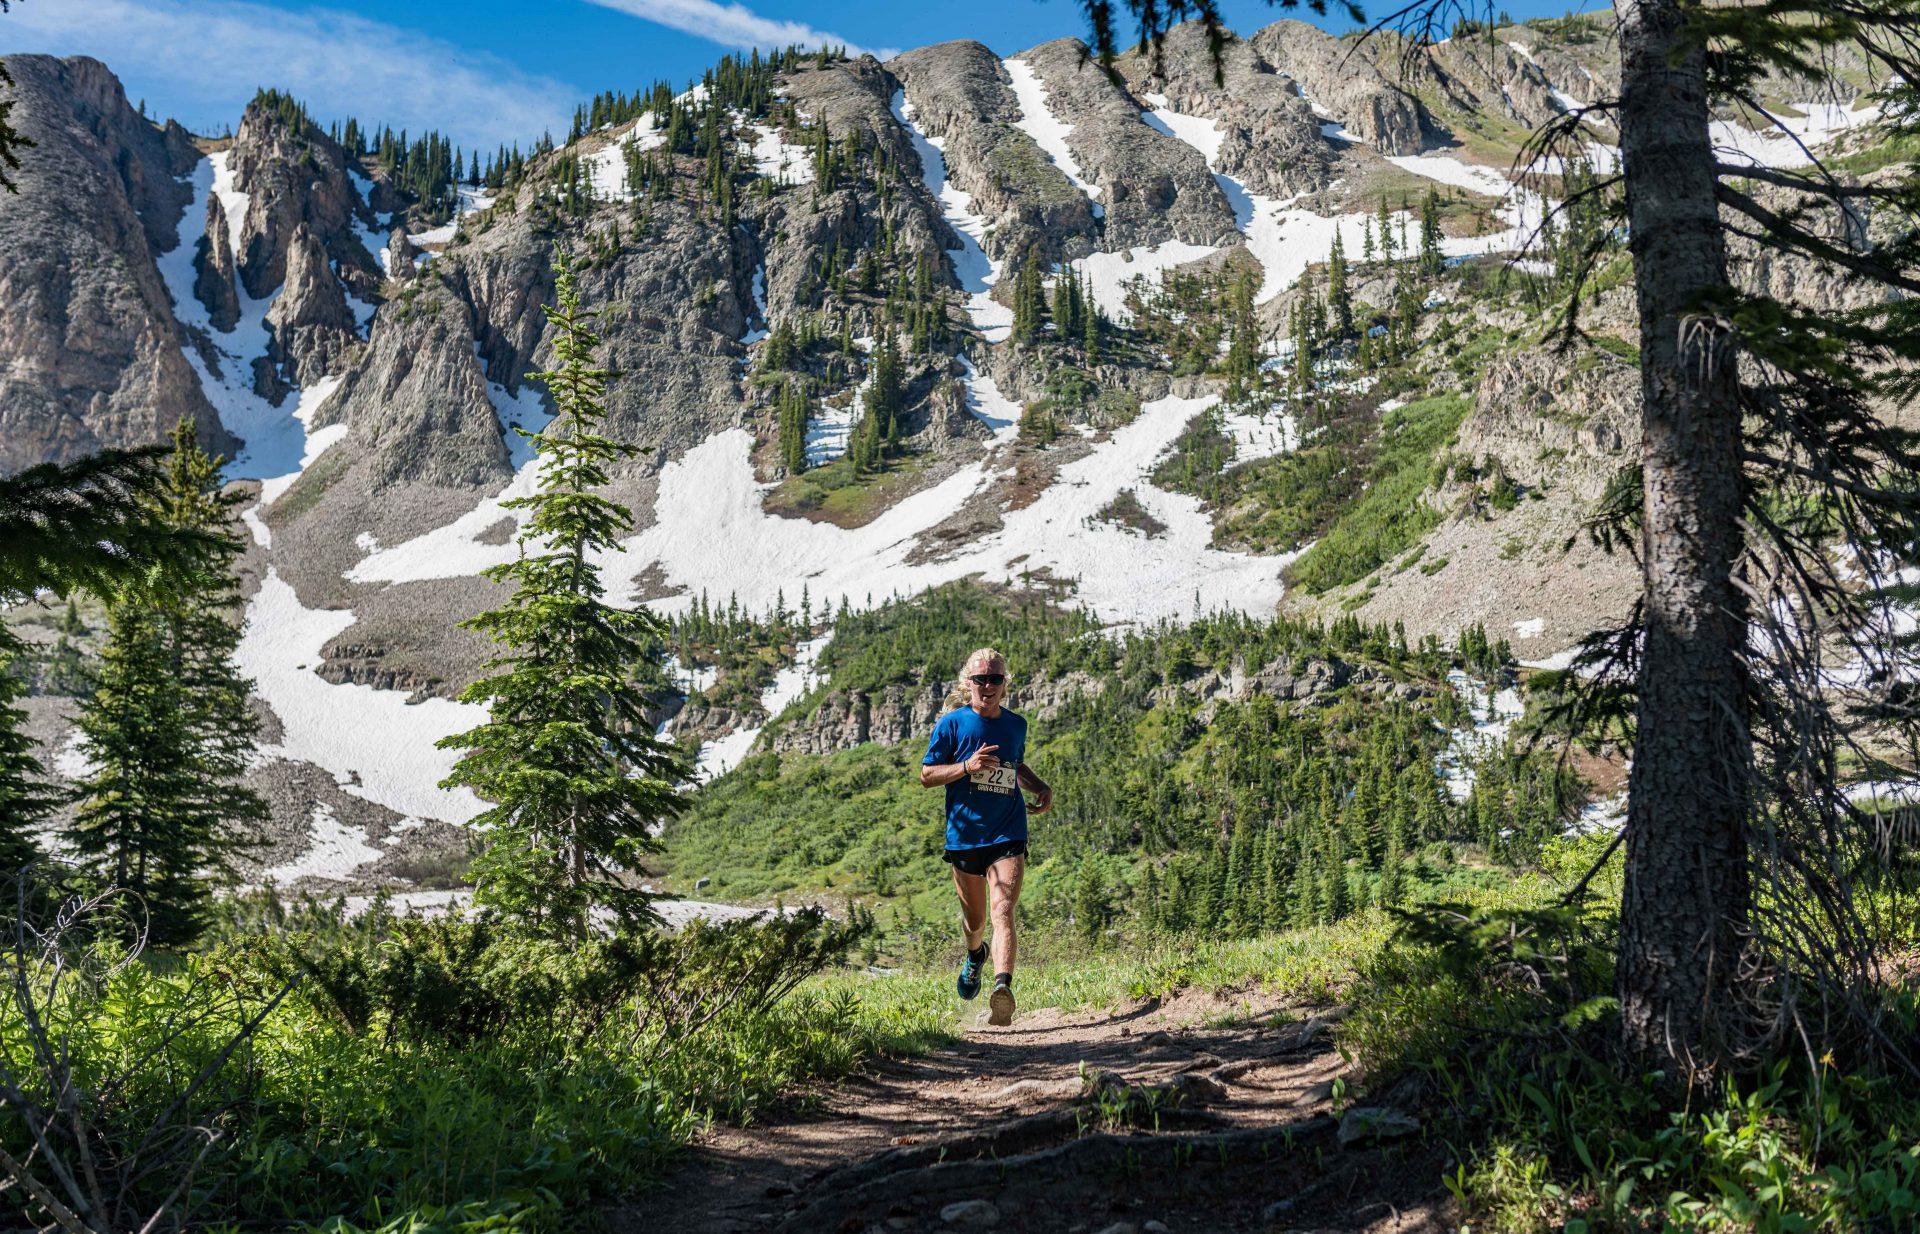 Grin & Bear It runner on course near Crested Butte